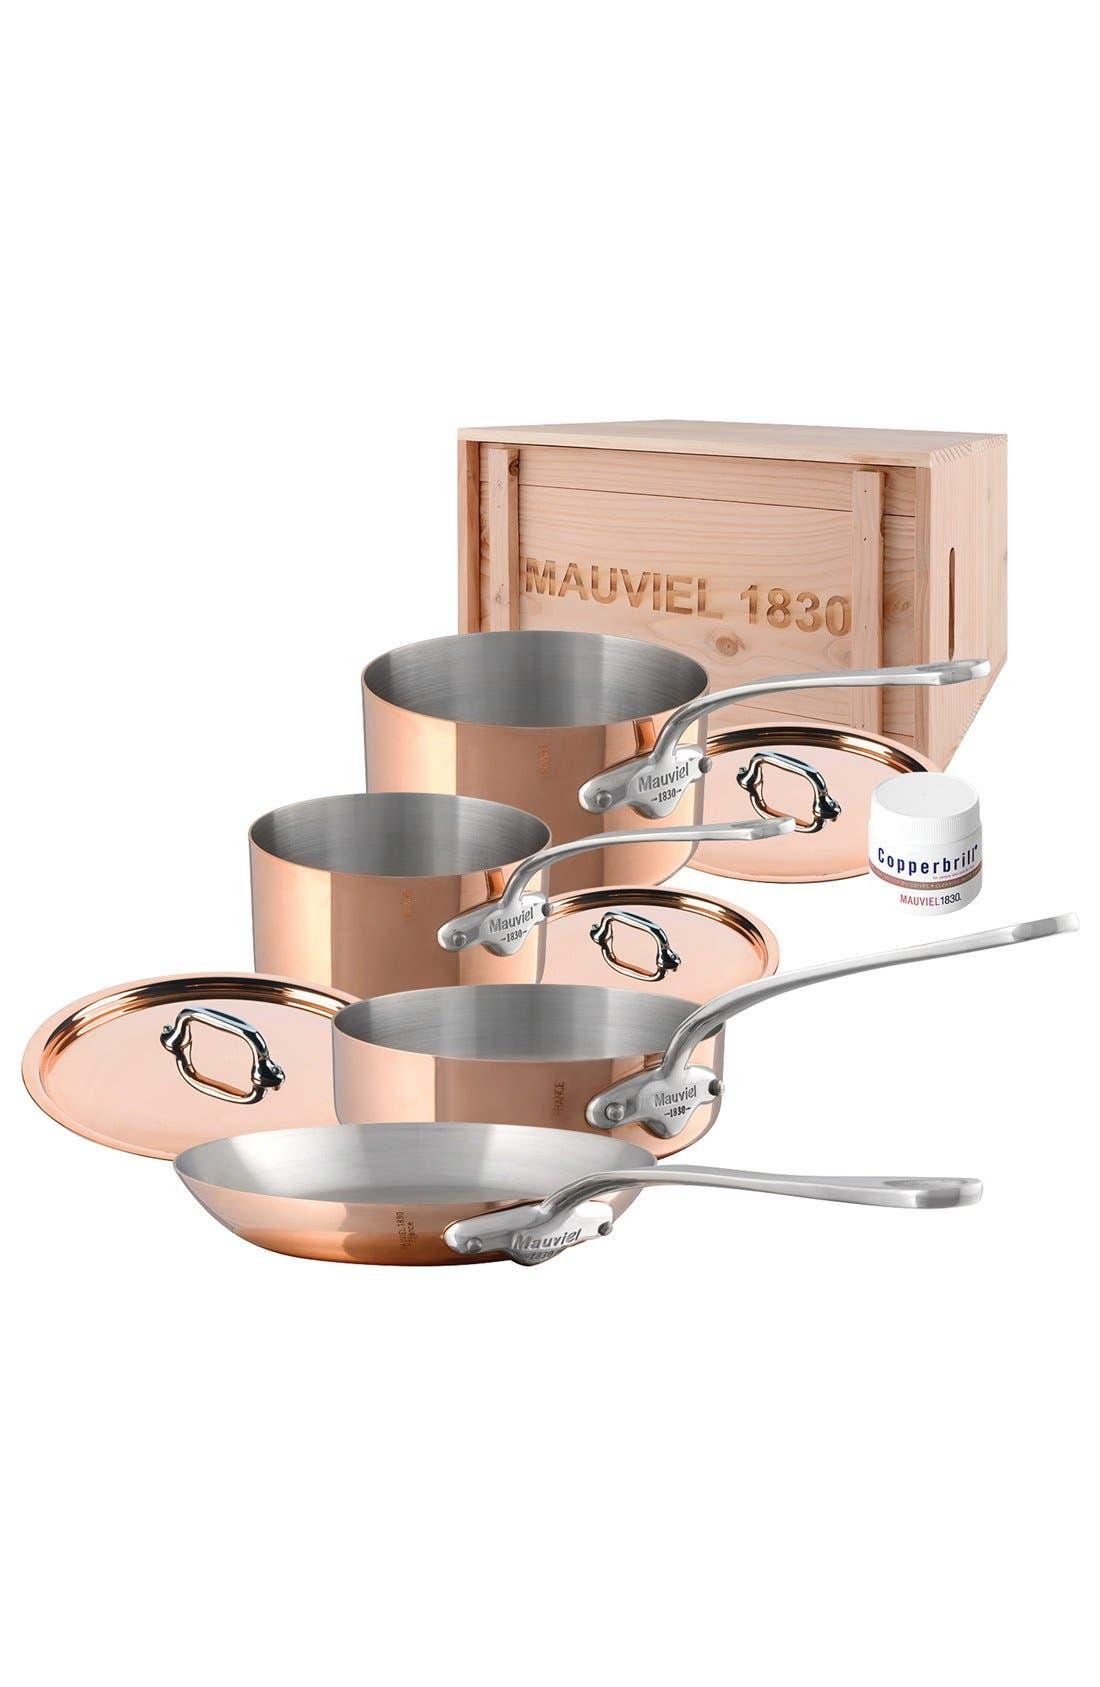 M'héritage - M'150s 7-Piece Copper & Stainless Steel Cookware Set,                         Main,                         color, Metallic Rust/Copper